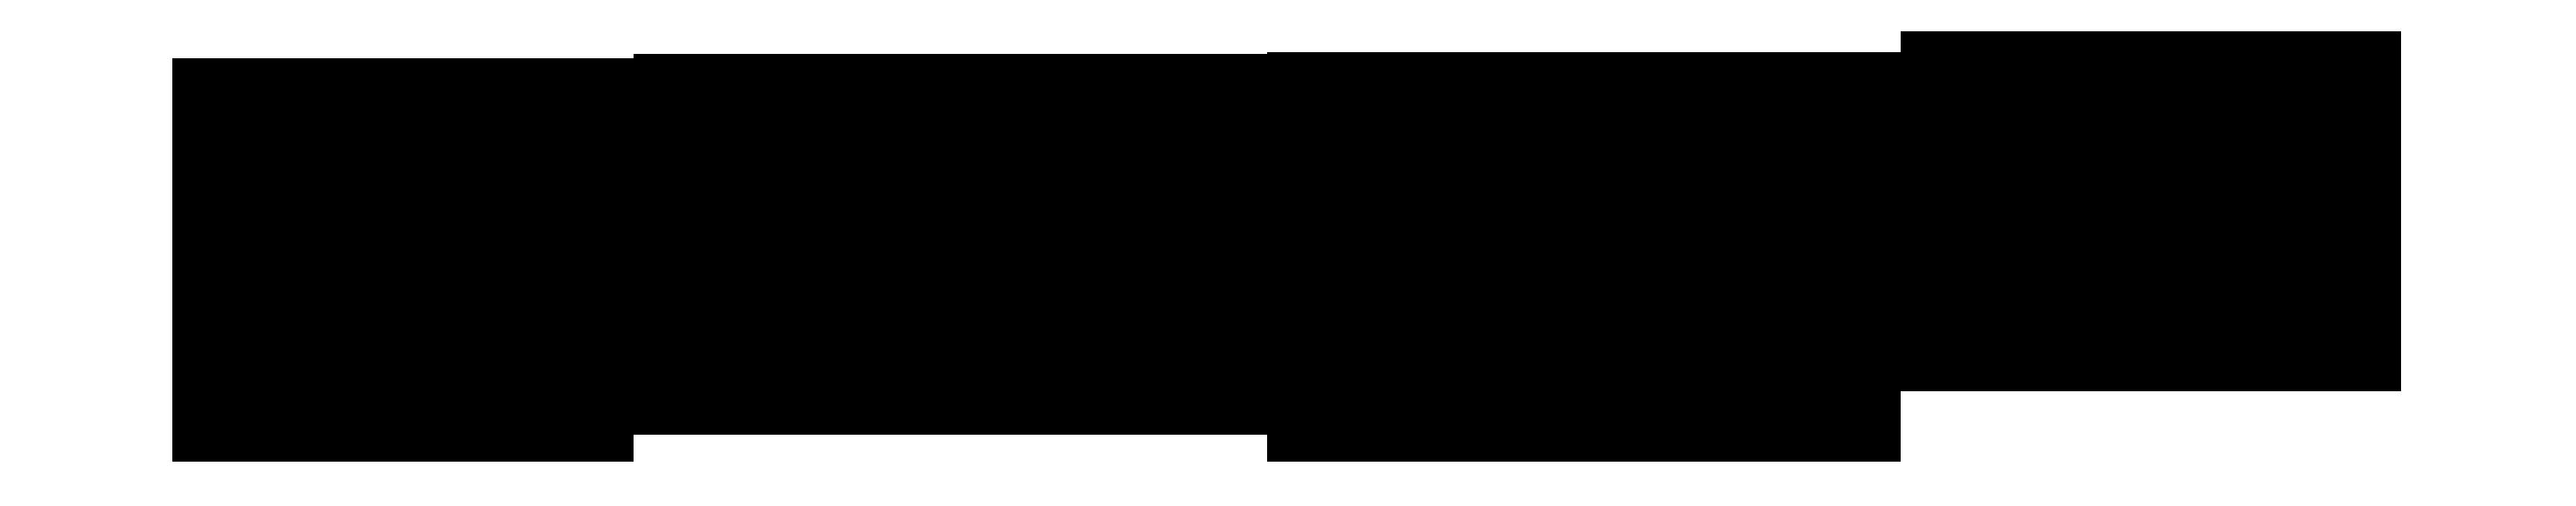 Typeface-Novel-Sans-Hairline-F19-Atlas-Font-Foundry